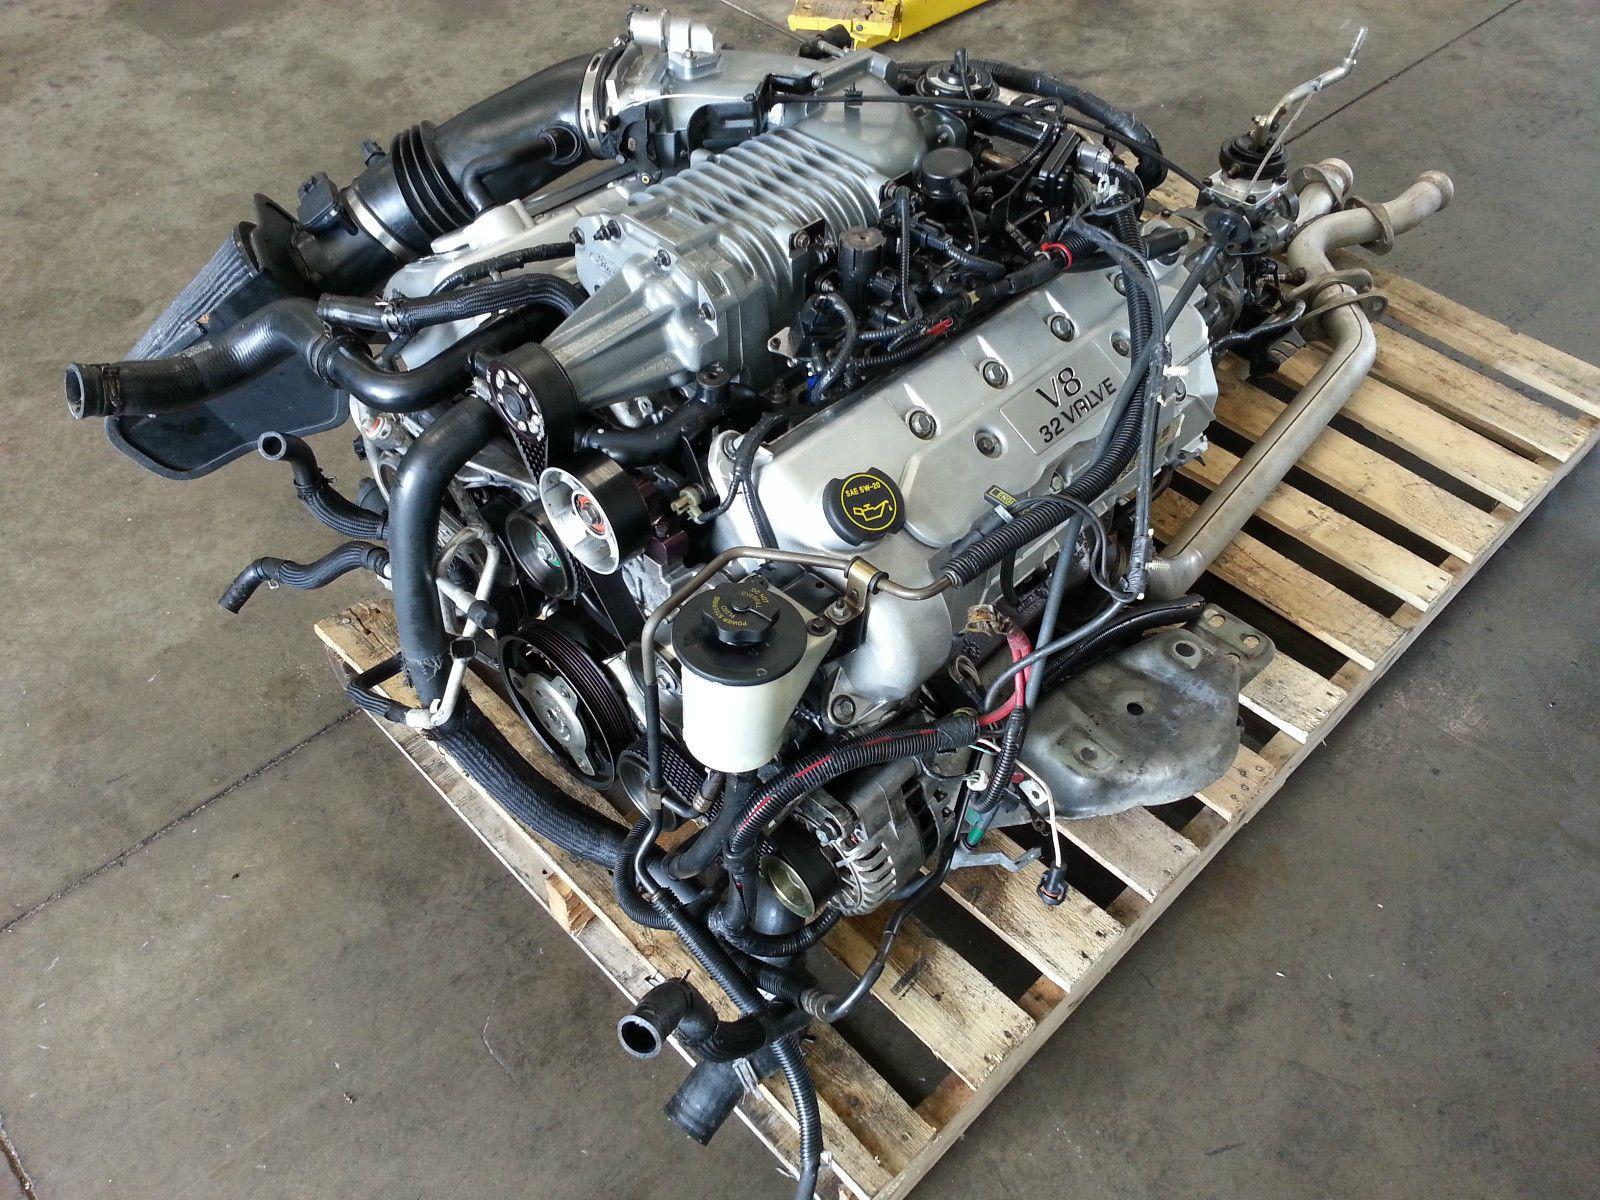 medium resolution of 2003 2004 mustang cobra 4 6 v8 engine t56 transmission dohc supercharged motor ebay